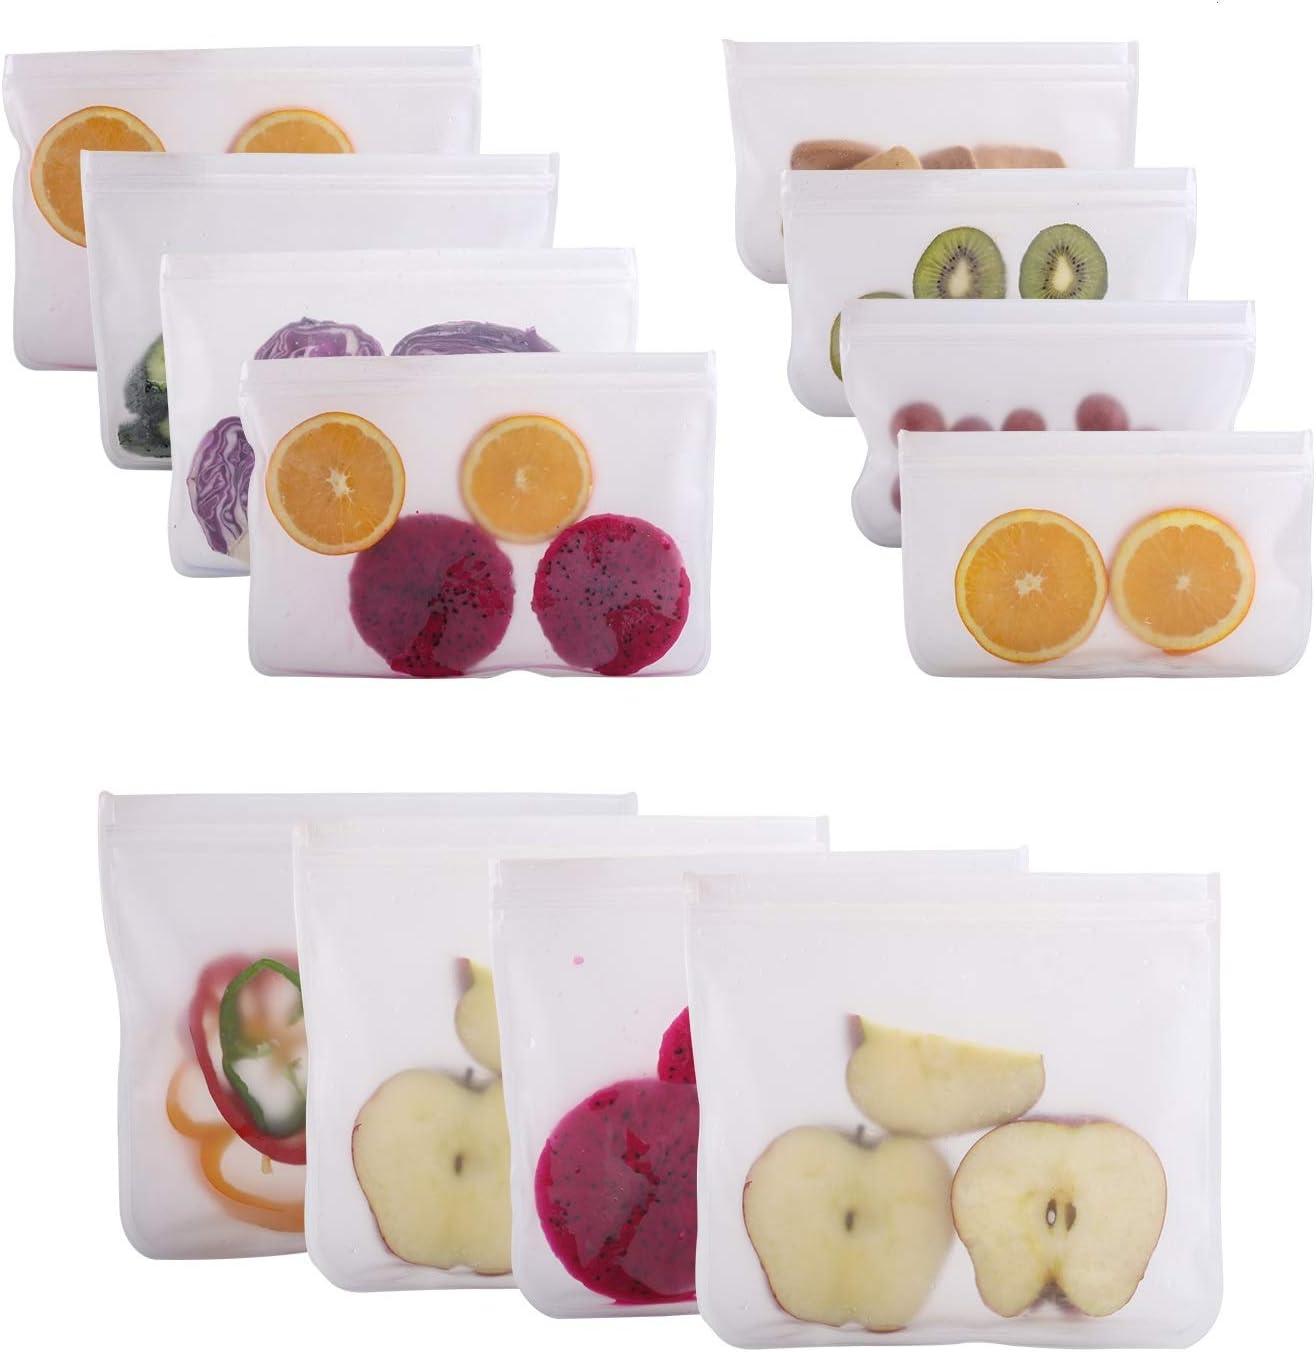 12 Pack Reusable Storage Bags, IDEALUX Waterproof Reusable Snack Bags, Leak Proof Freezer Ziplock Bags, Food Grade PEVA Lunch Bags for Sandwich and Fruit